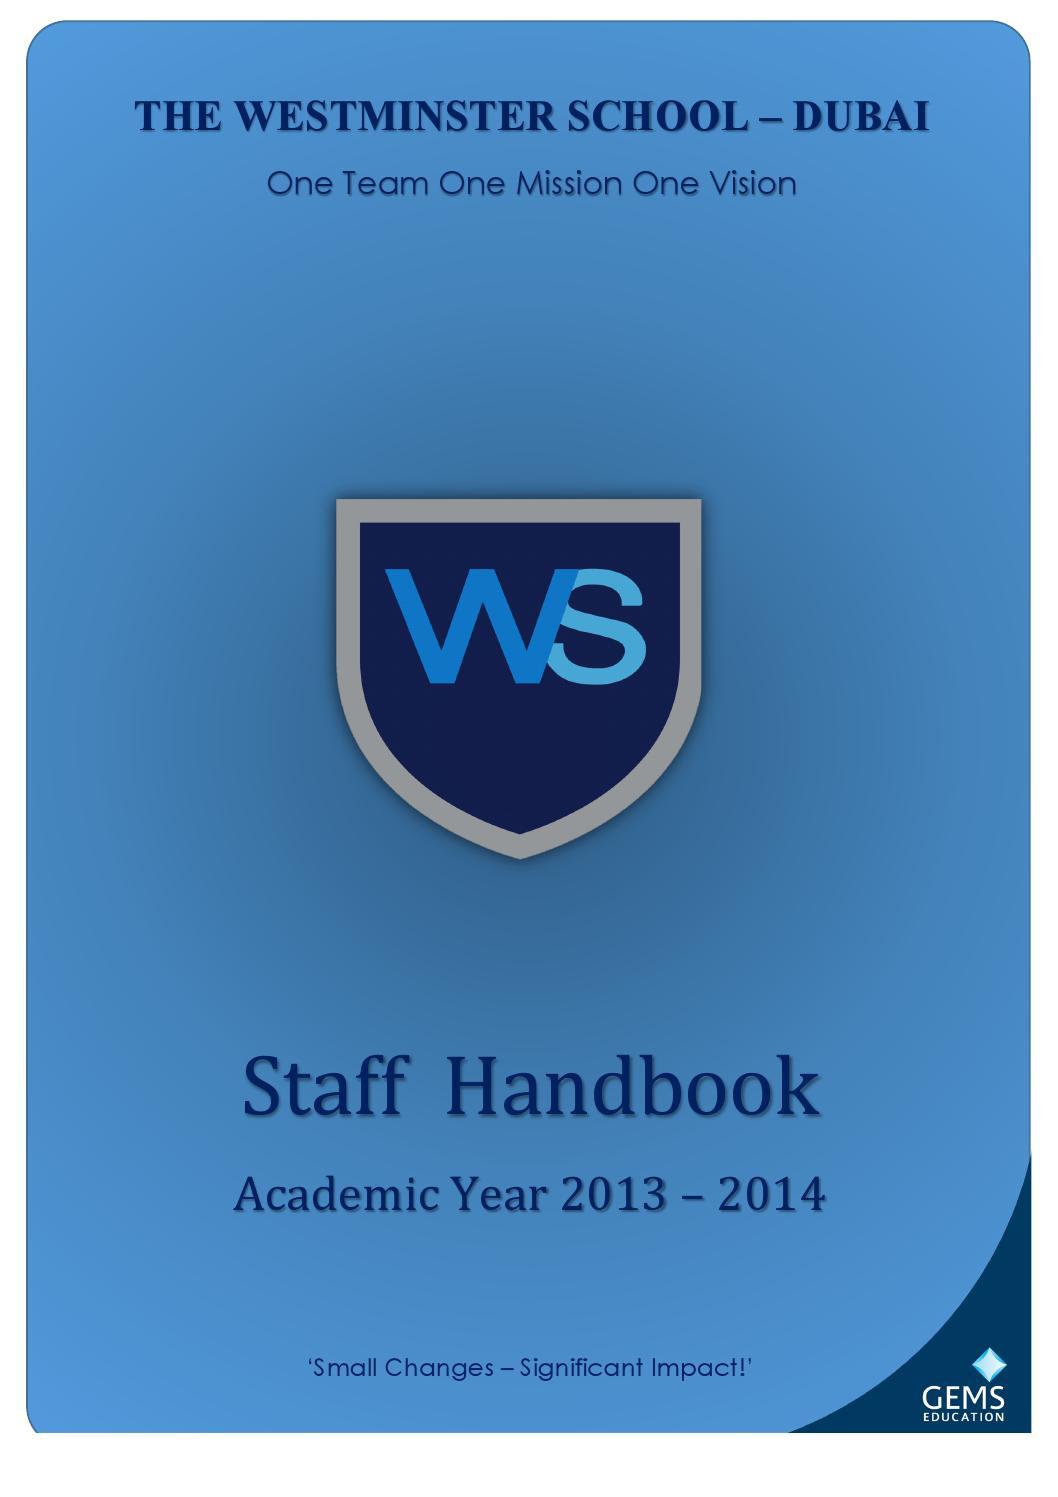 Gems teachers handbook 2014 by Curriculum Hub - issuu